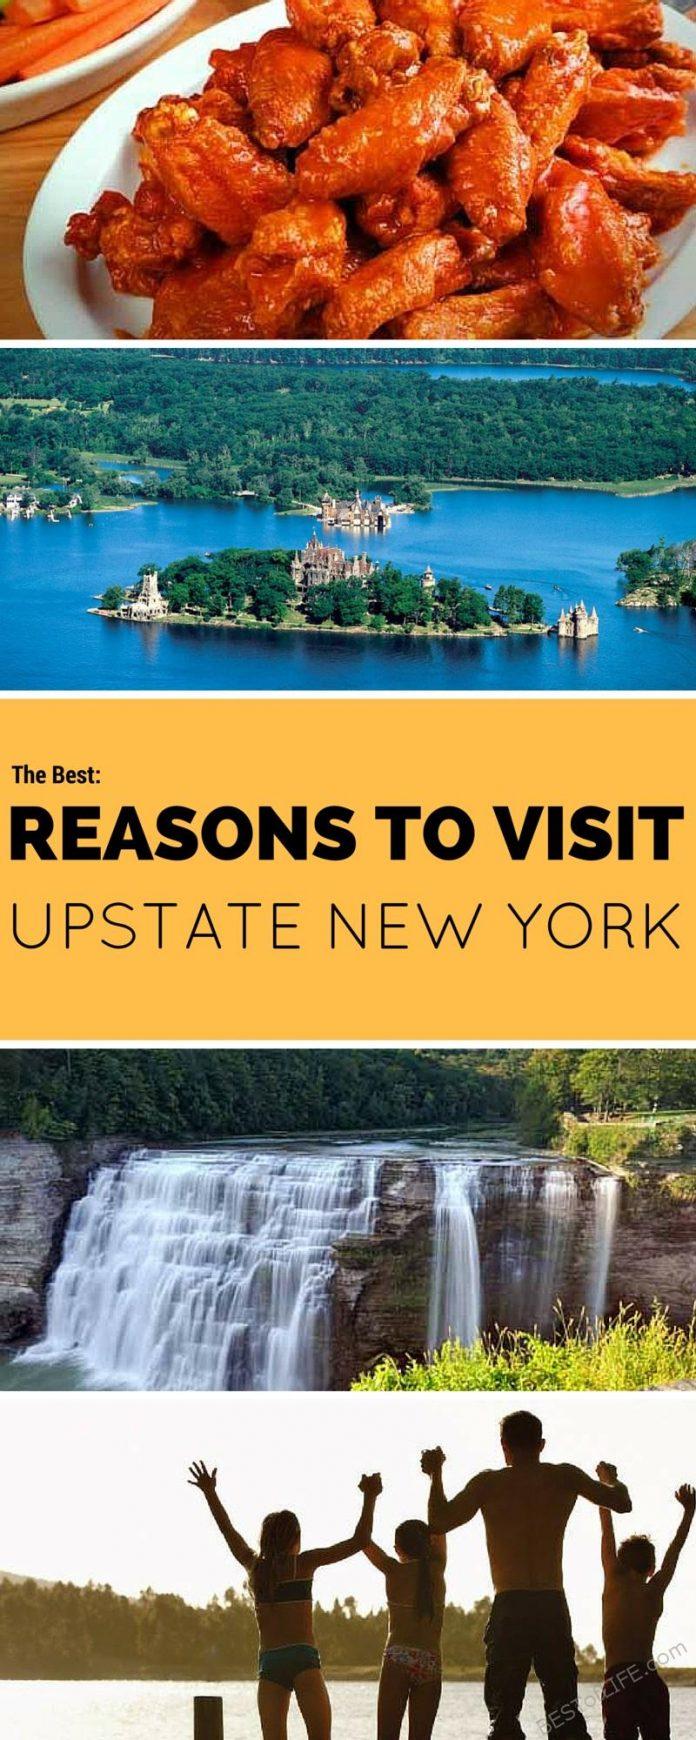 Dating upstate new york